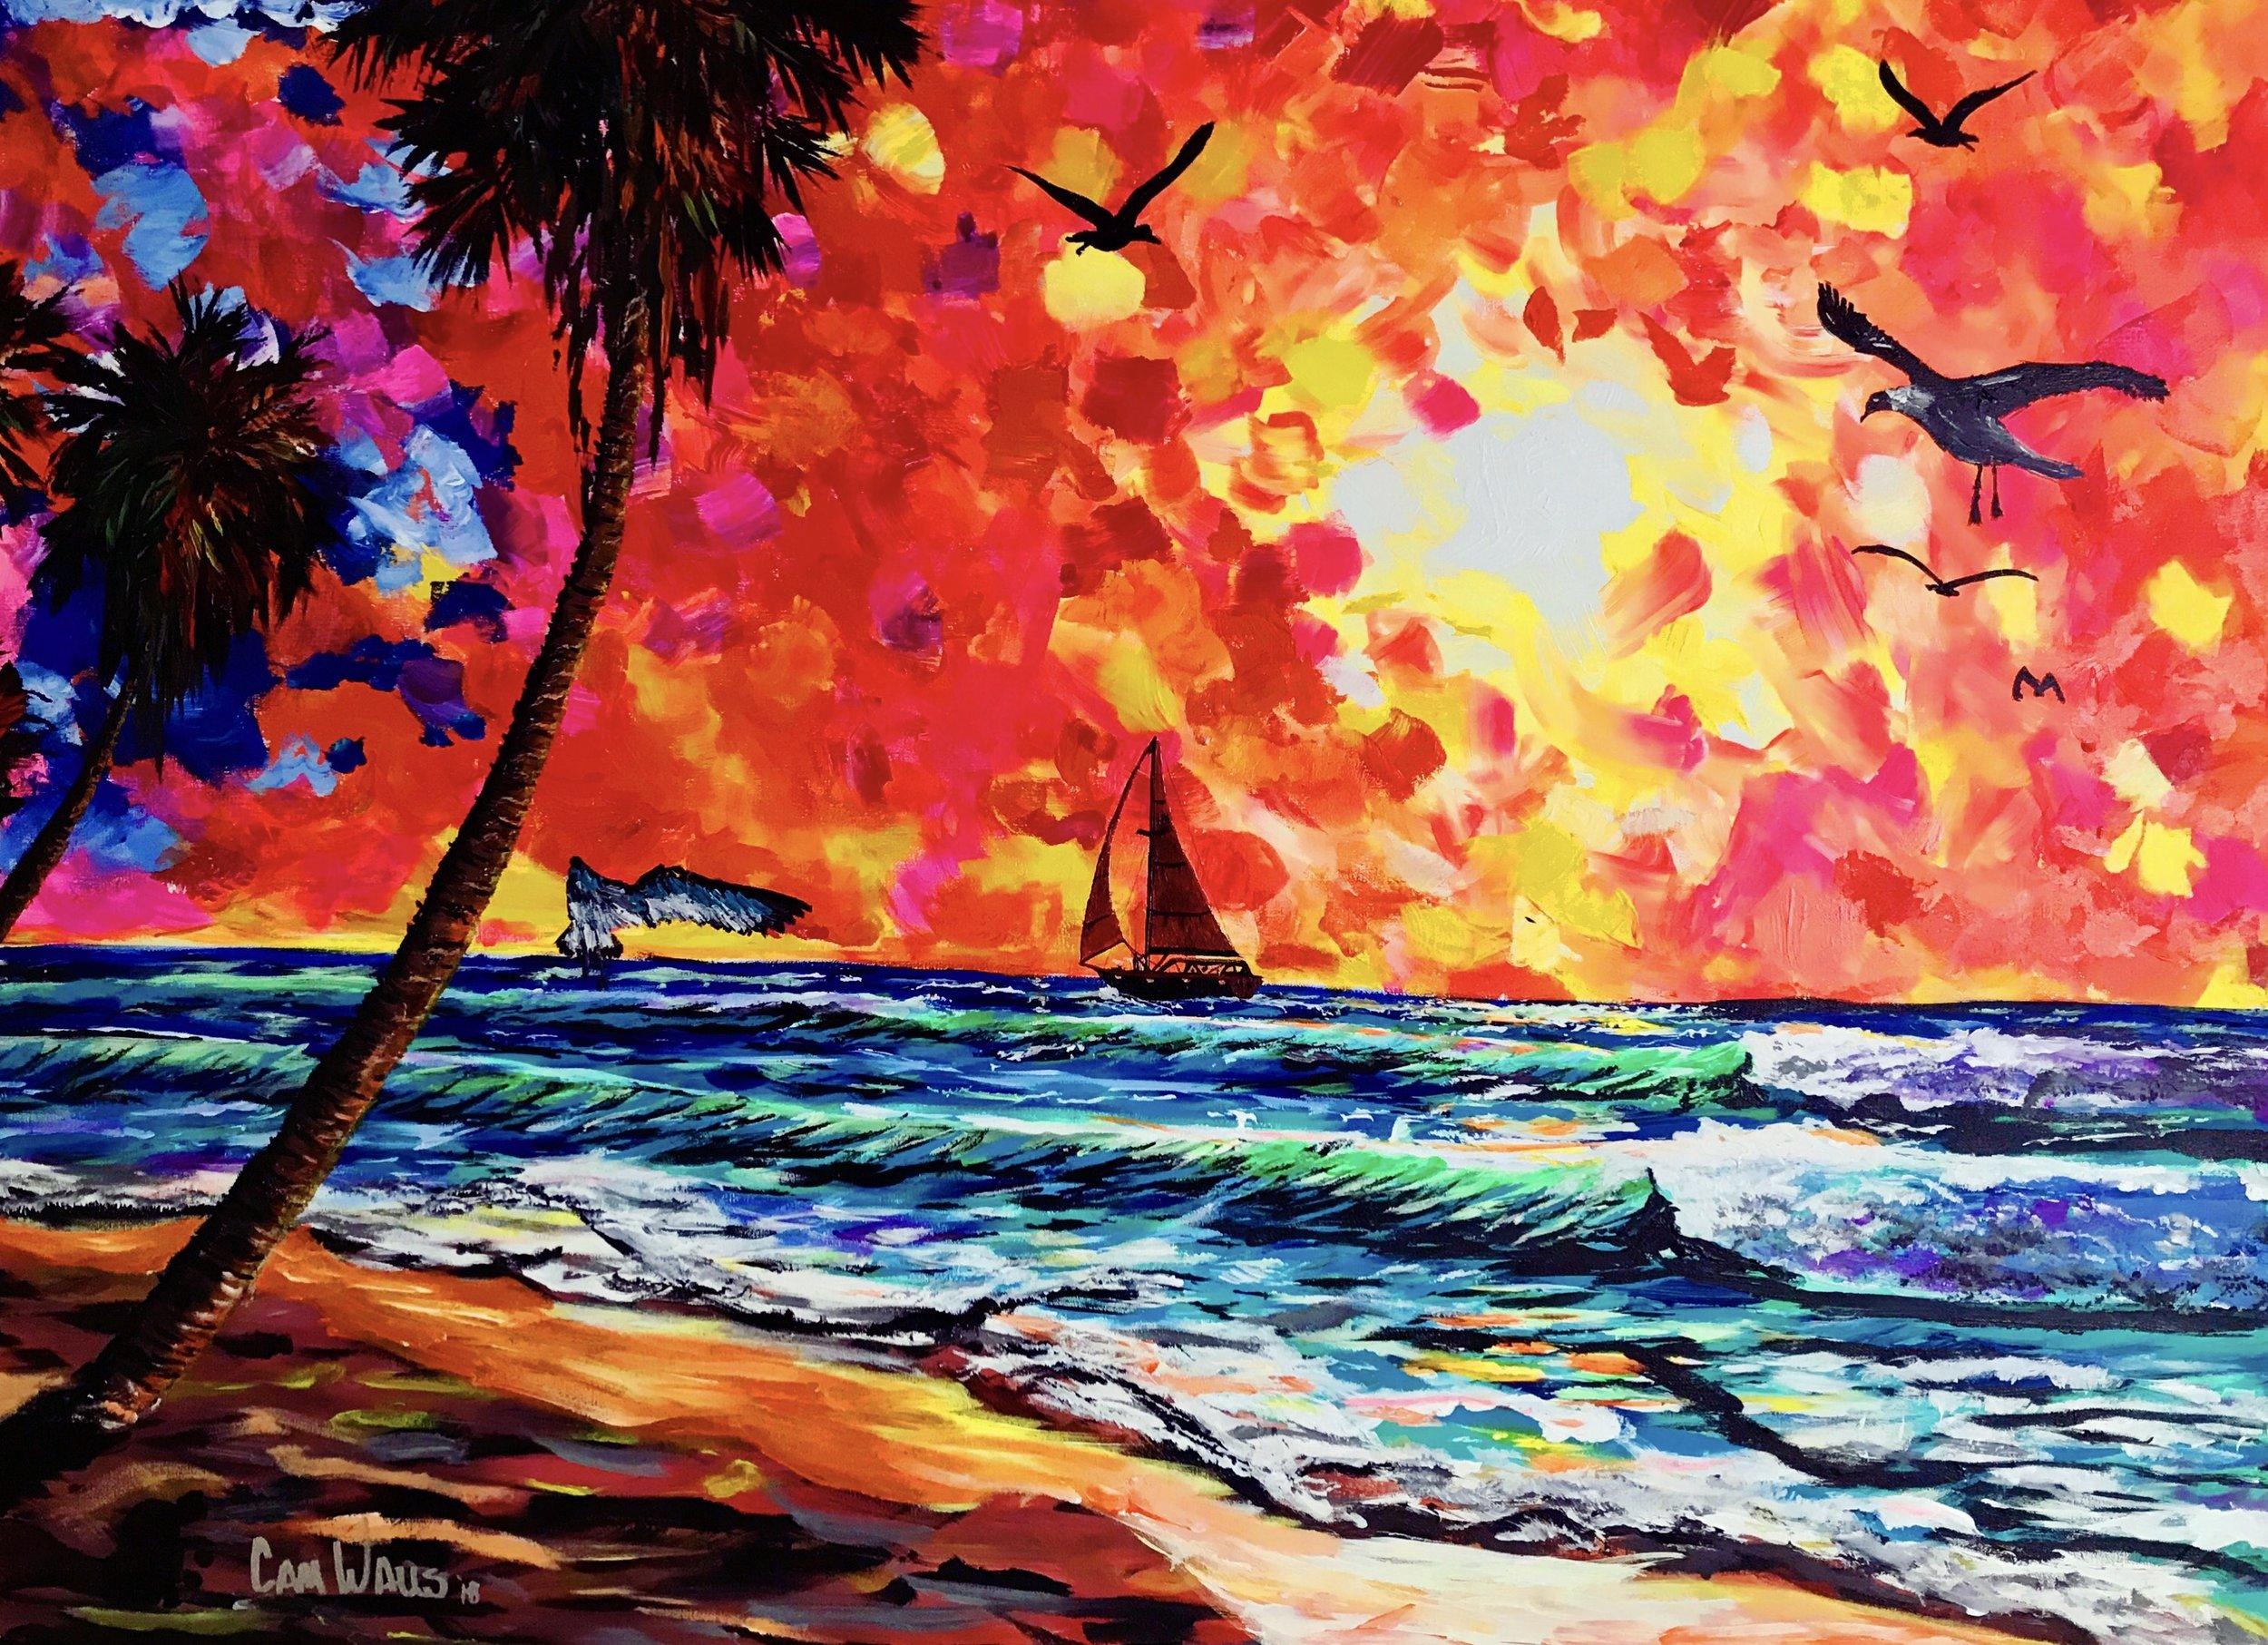 Cameron Walls   Come Sail Away   Acrylic on Canvas  48x36